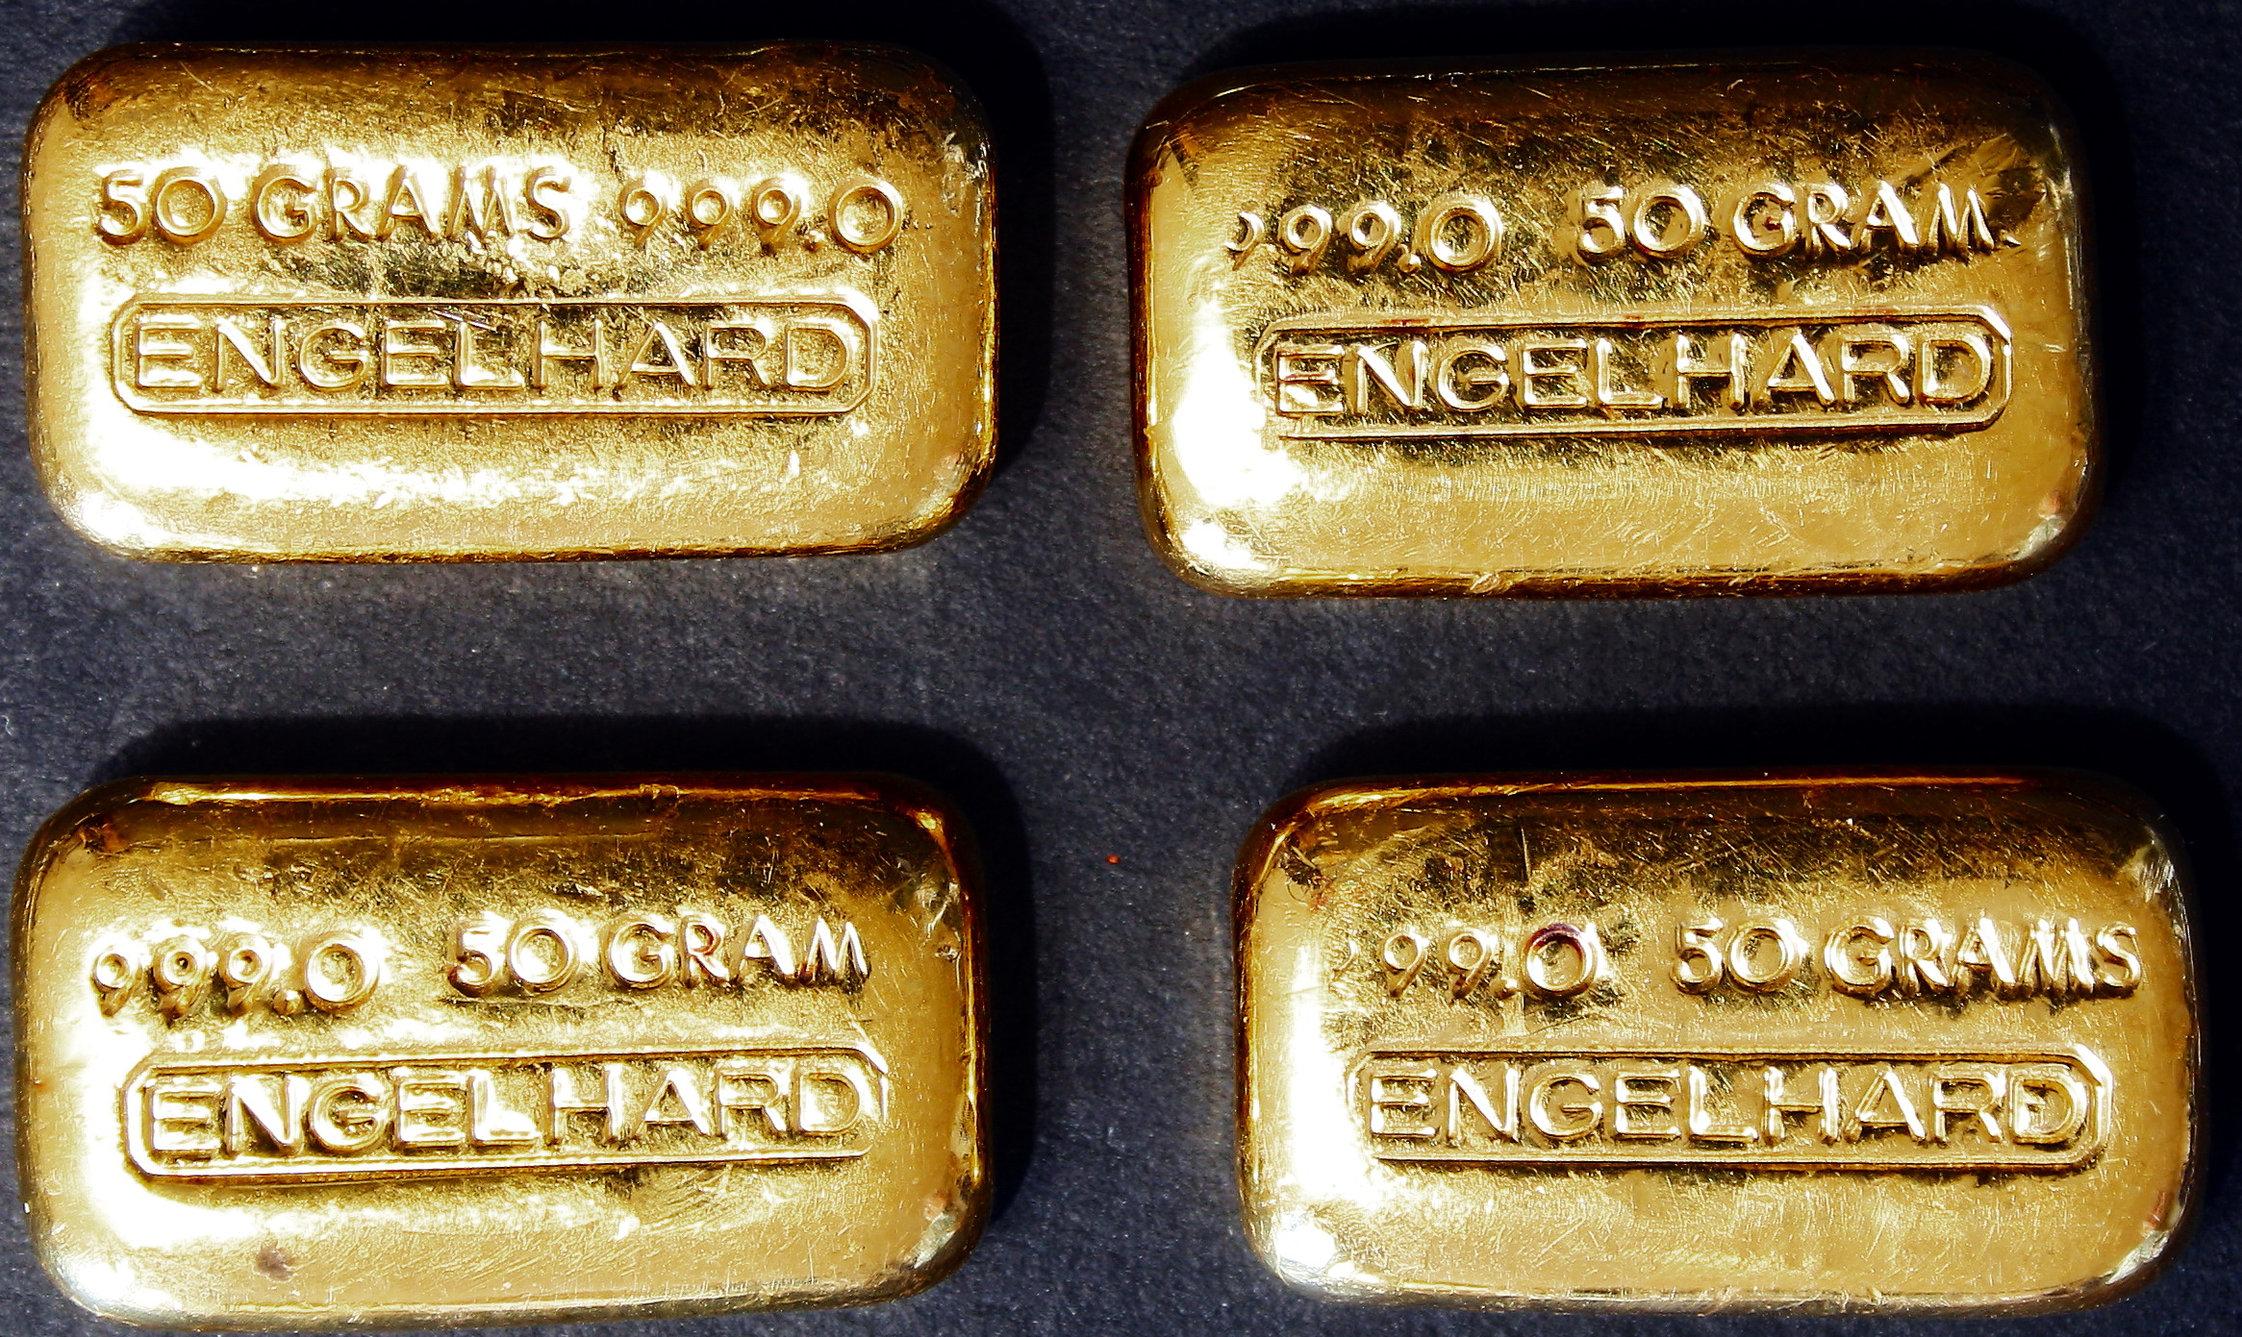 Engelhard 50 Gram Vintage Gold Bars